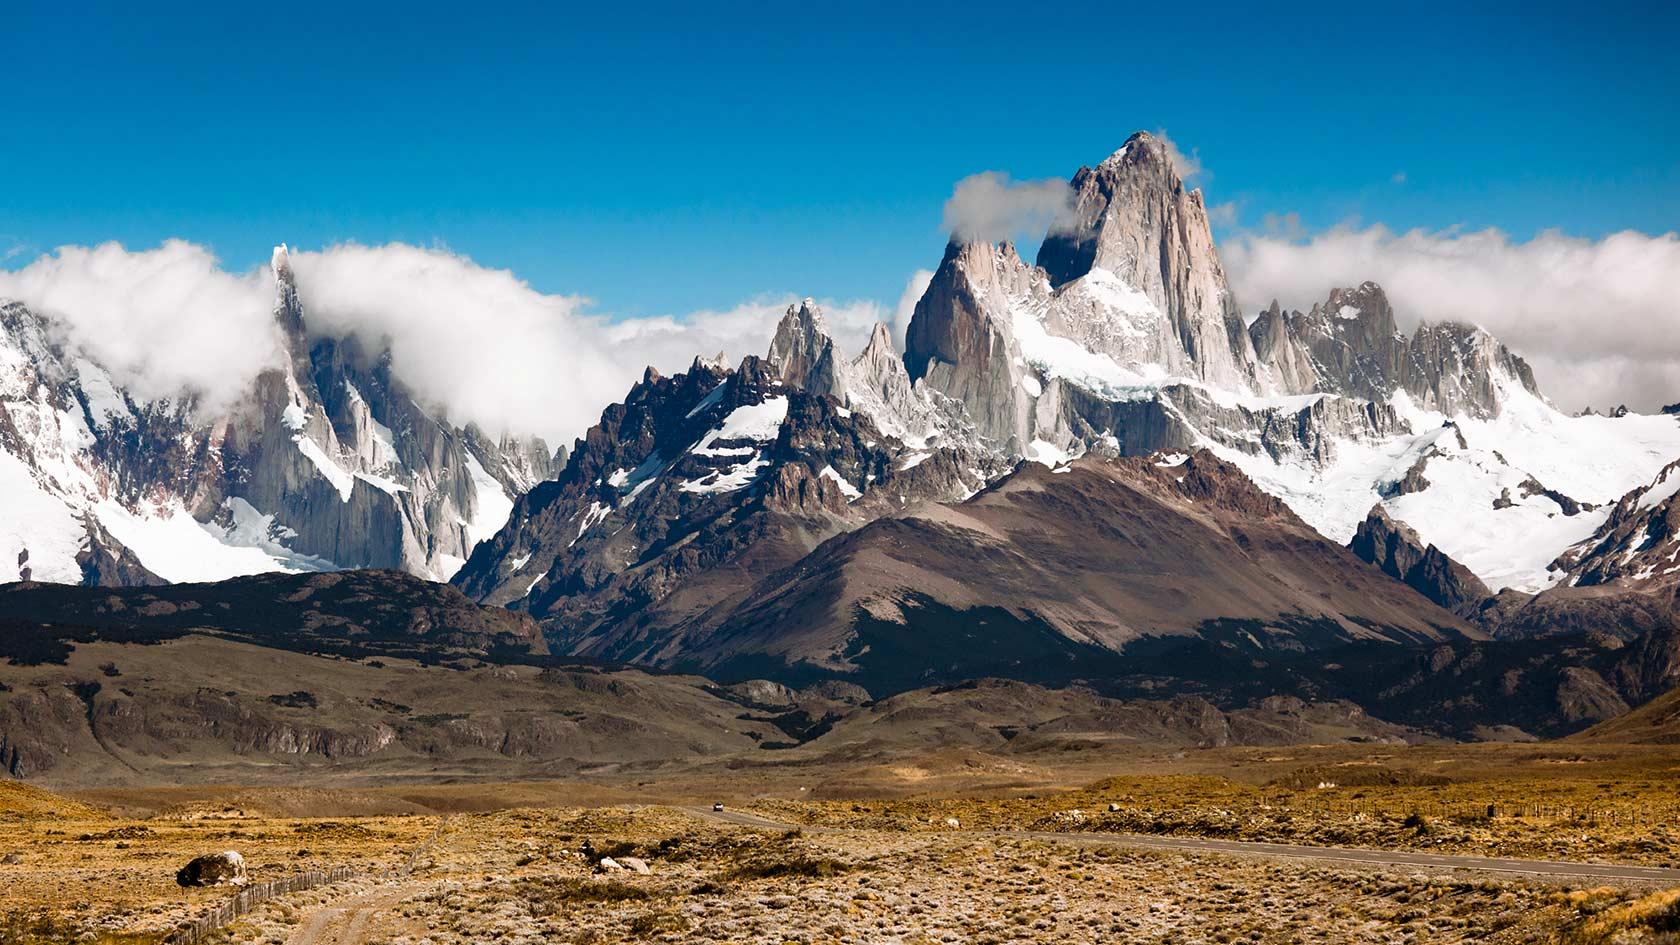 lets-travel-to-argentina-patagonia-el-chalten-with-jakub-polomski-1